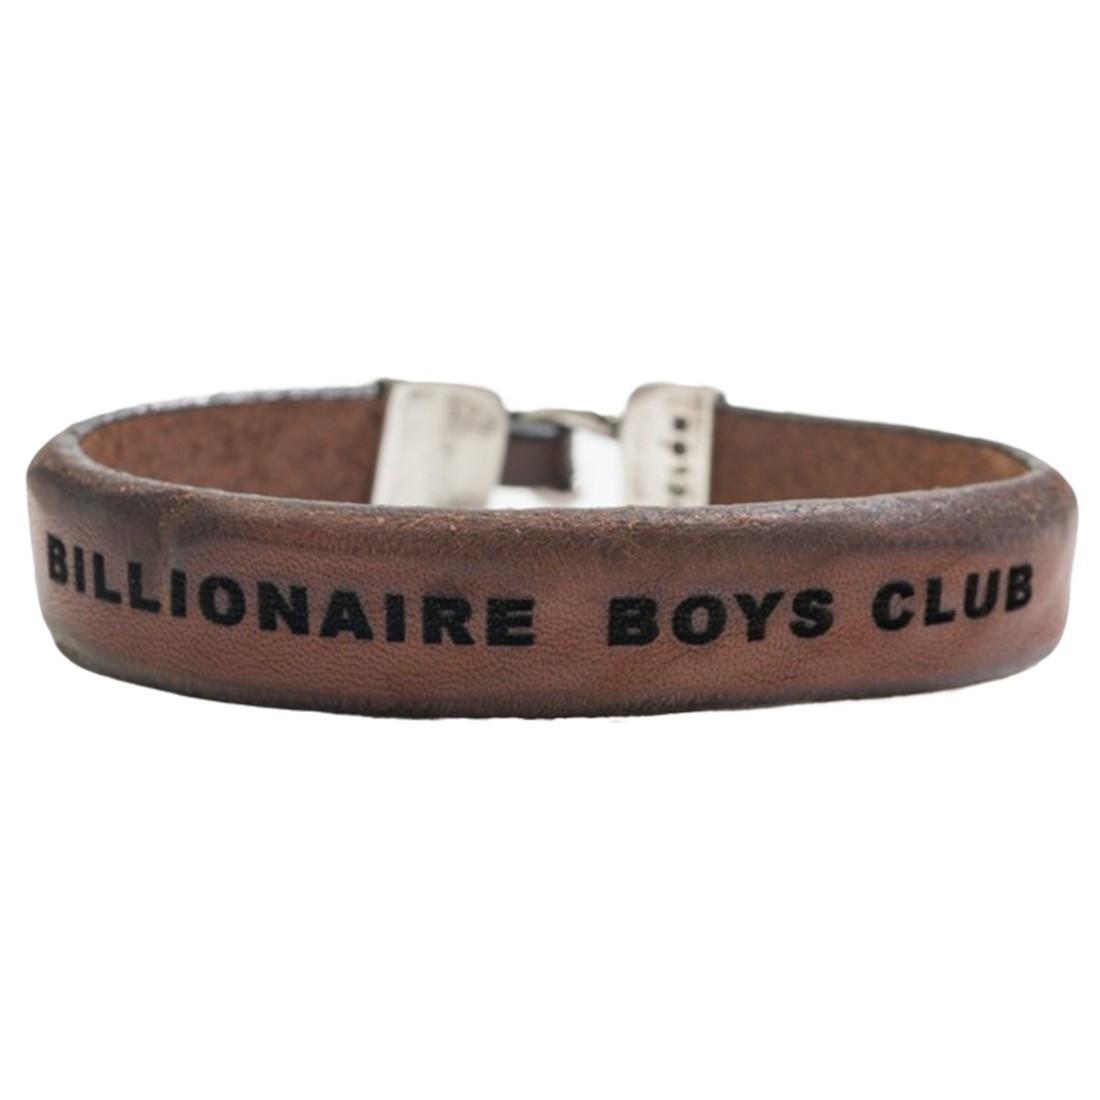 Billionaire Boys Club Synergy Bracelet (brown)